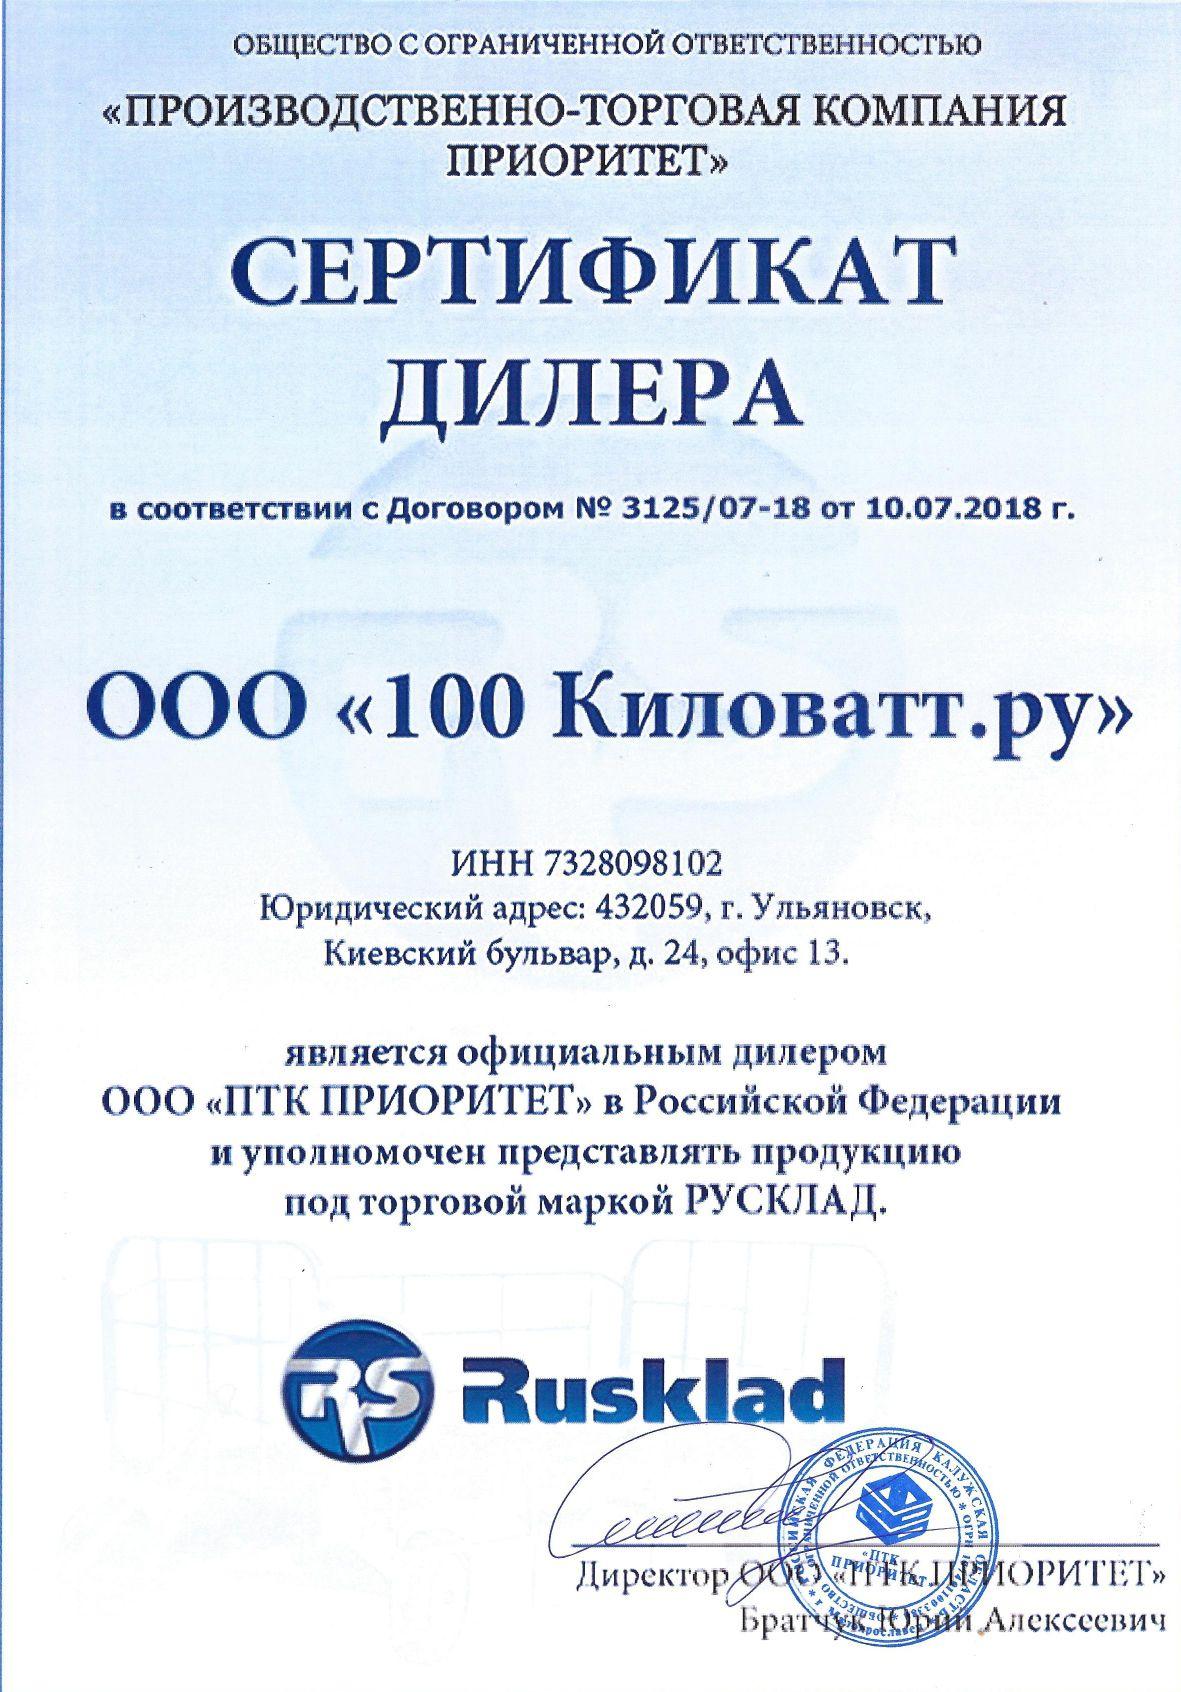 РУСКЛАД - Сертификат дилера